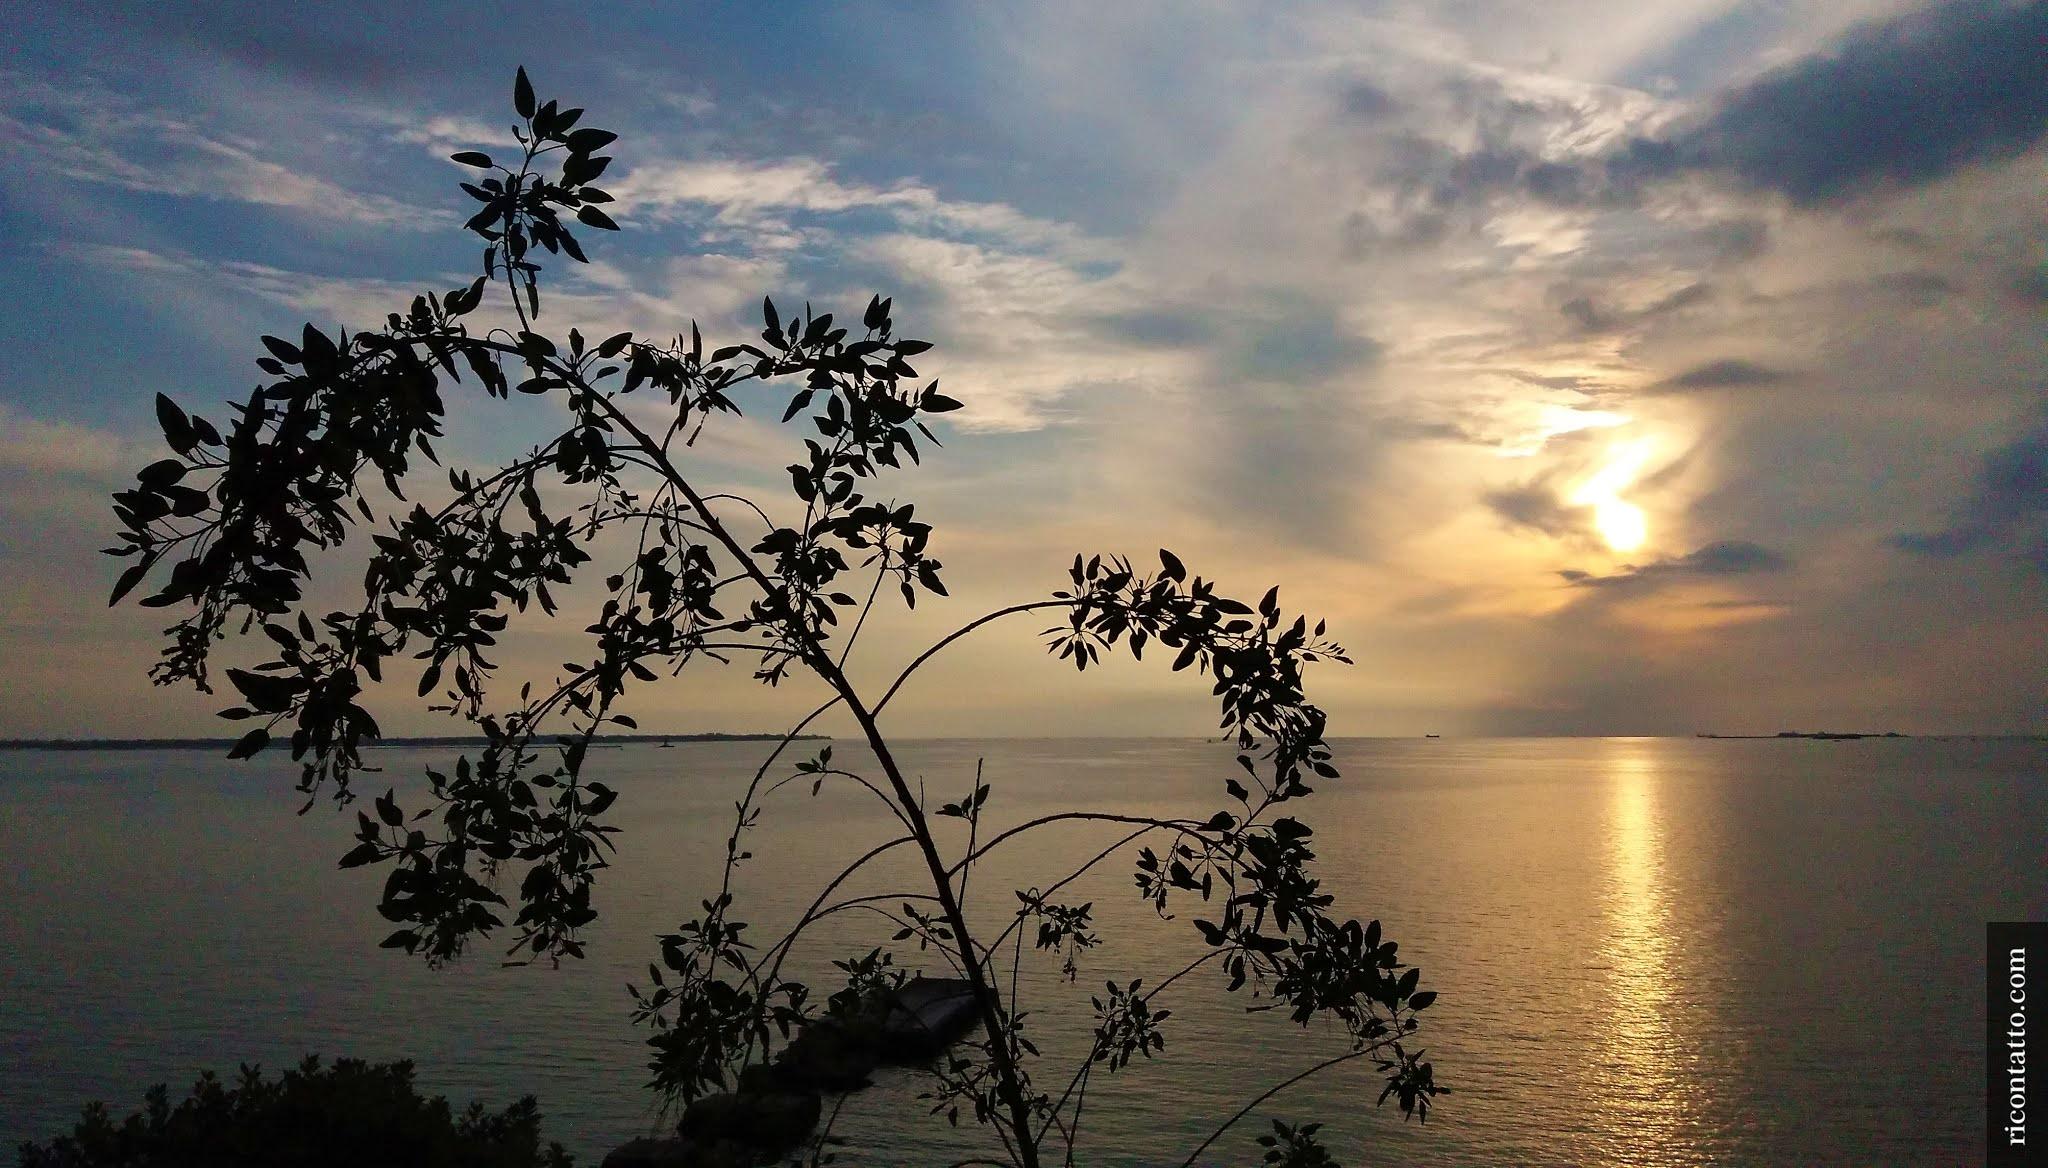 Taranto, Puglia, Italy - Photo #15 by Ricontatto.com